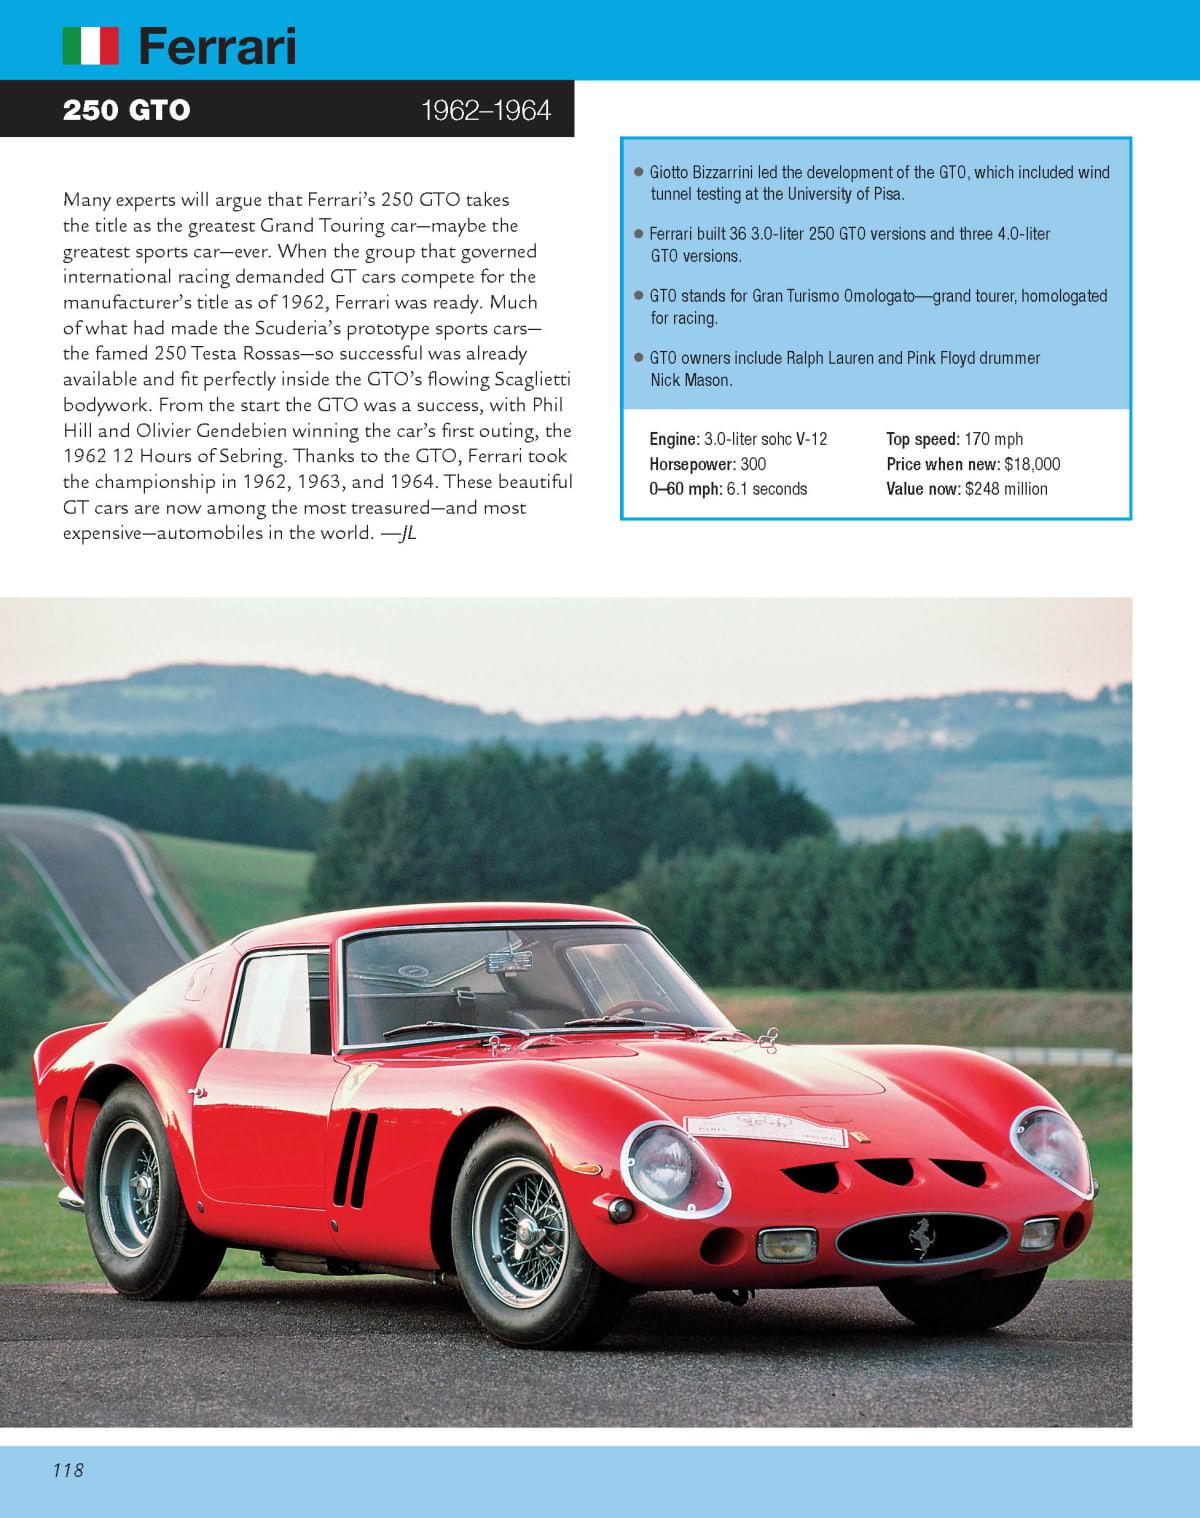 The luscious Ferrari 250 GTO insert